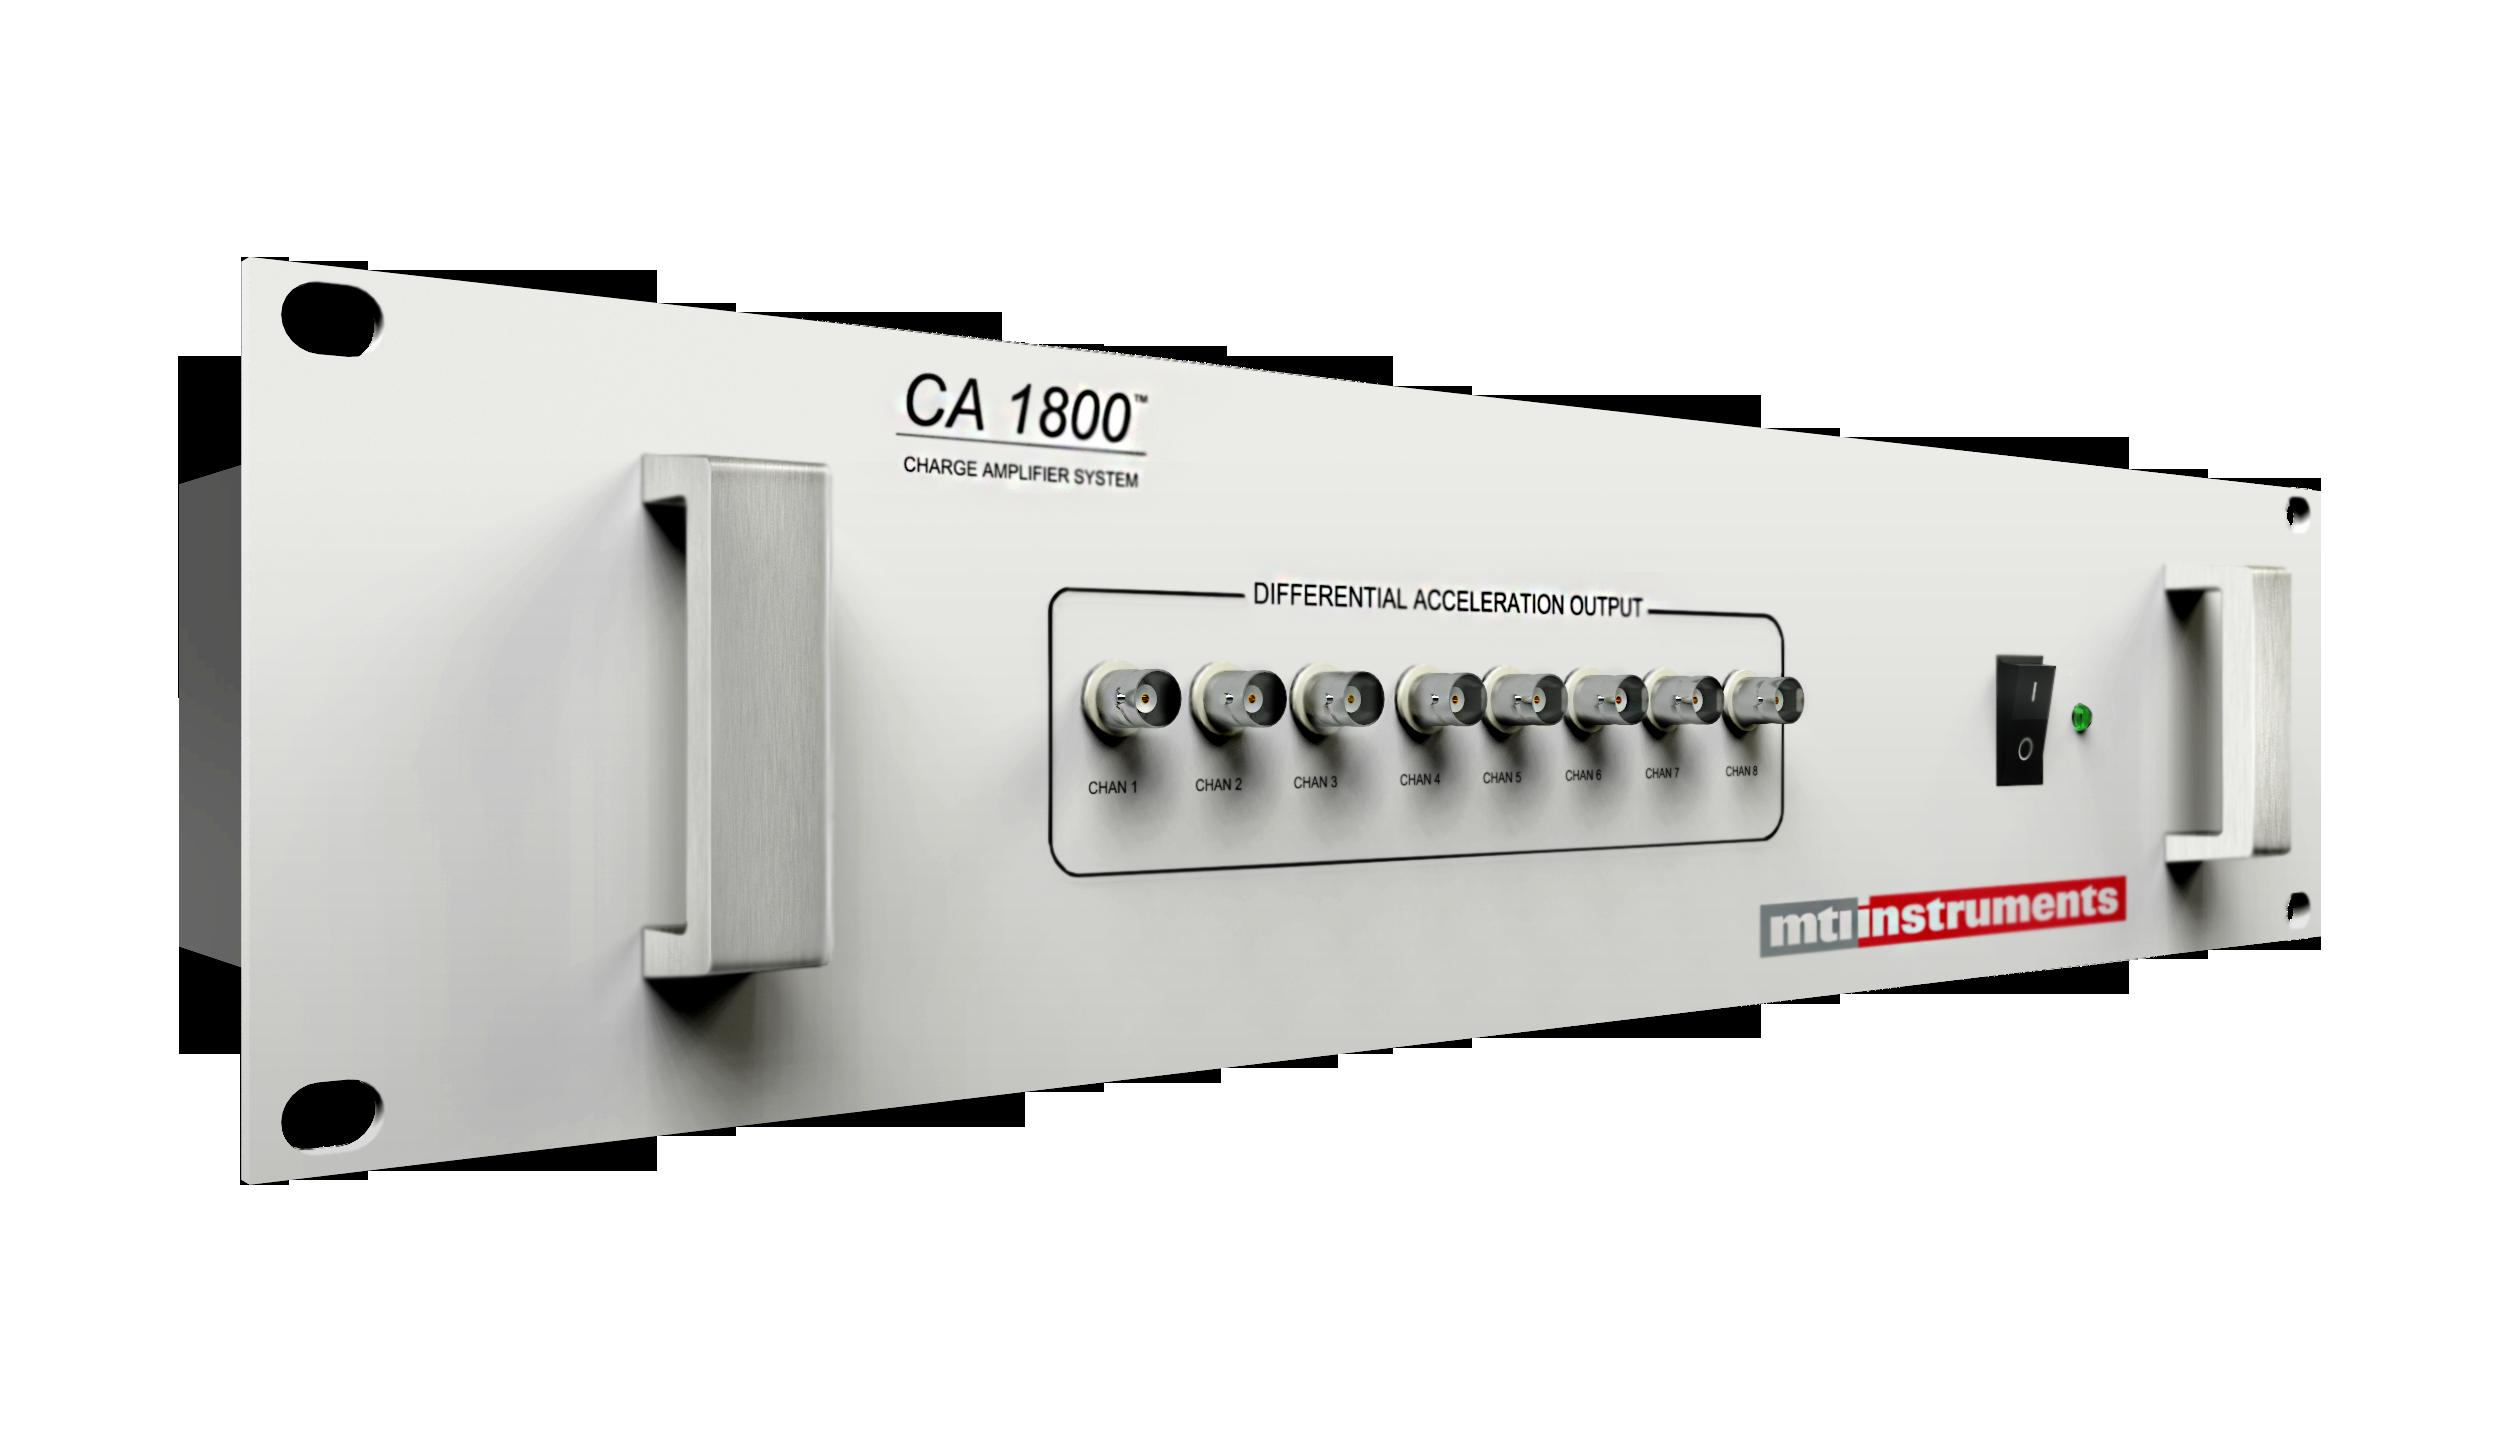 CA1800